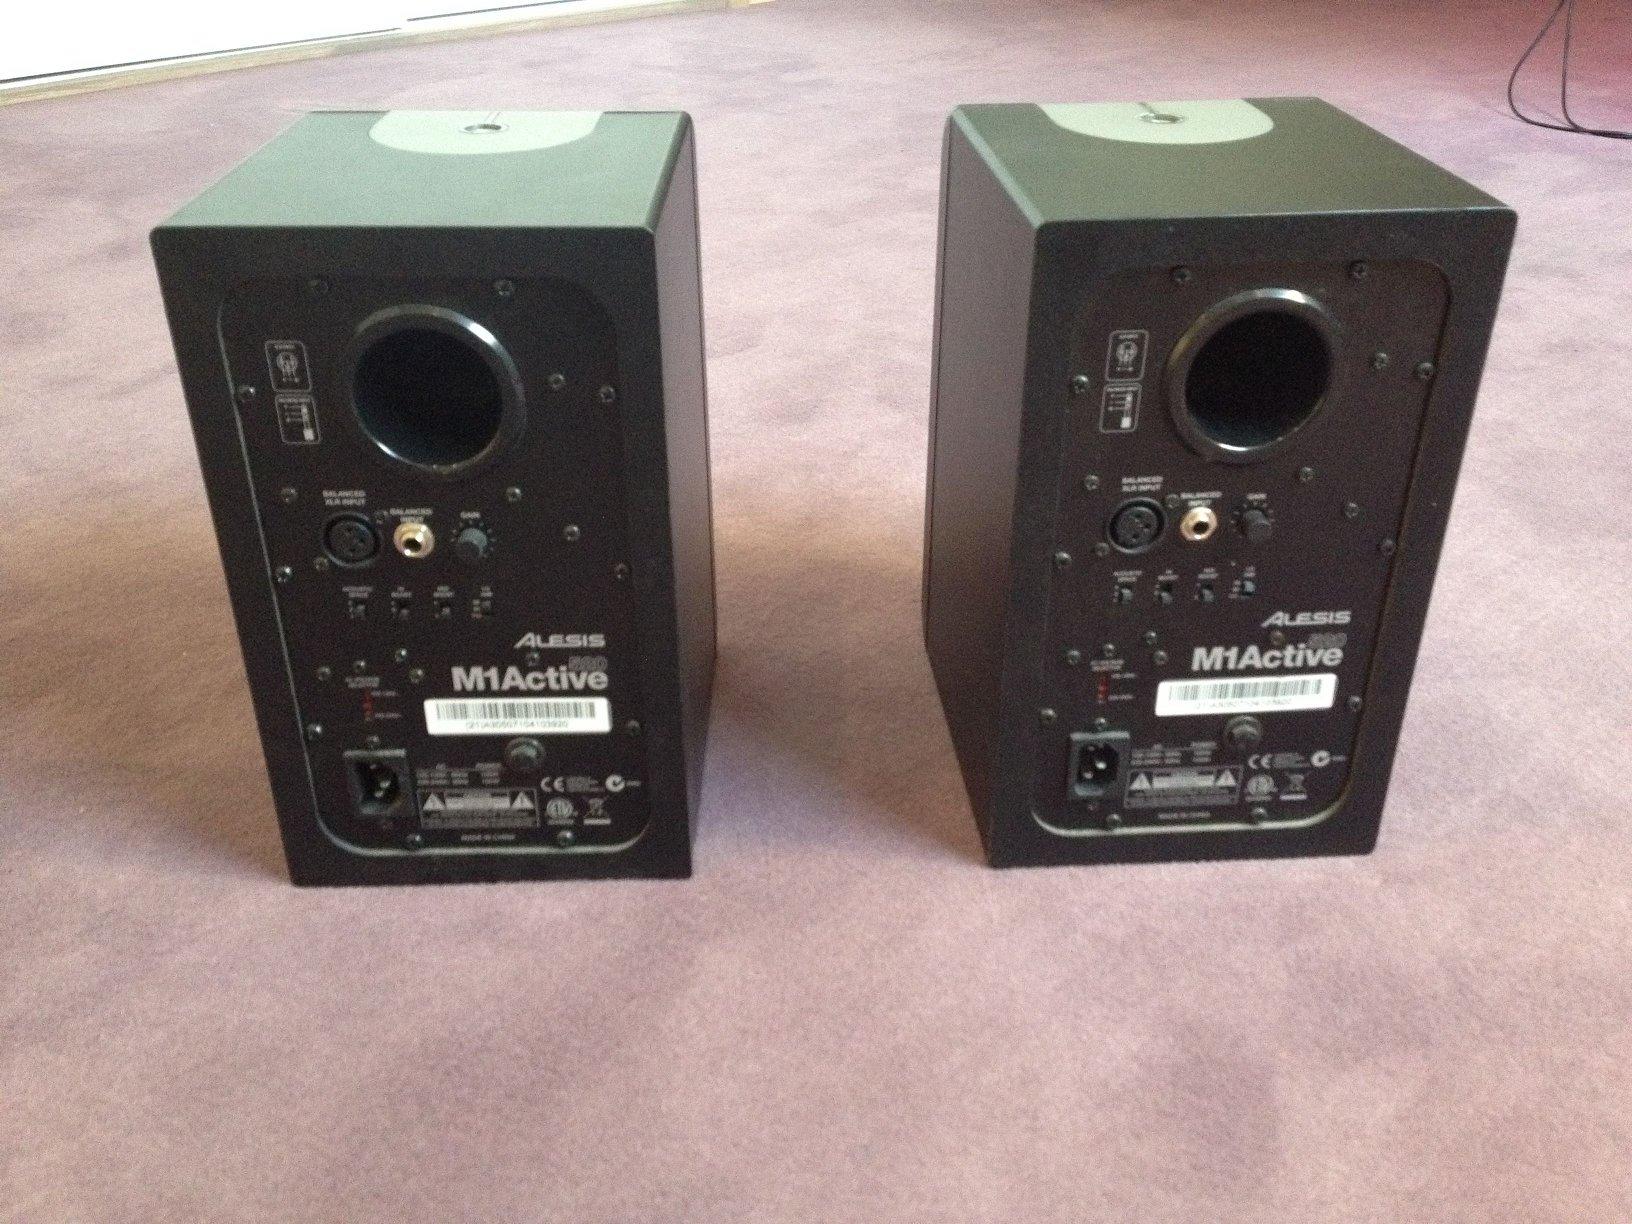 alesis m1active 520 image 300687 audiofanzine rh en audiofanzine com Kindle Fire User Guide User Manual